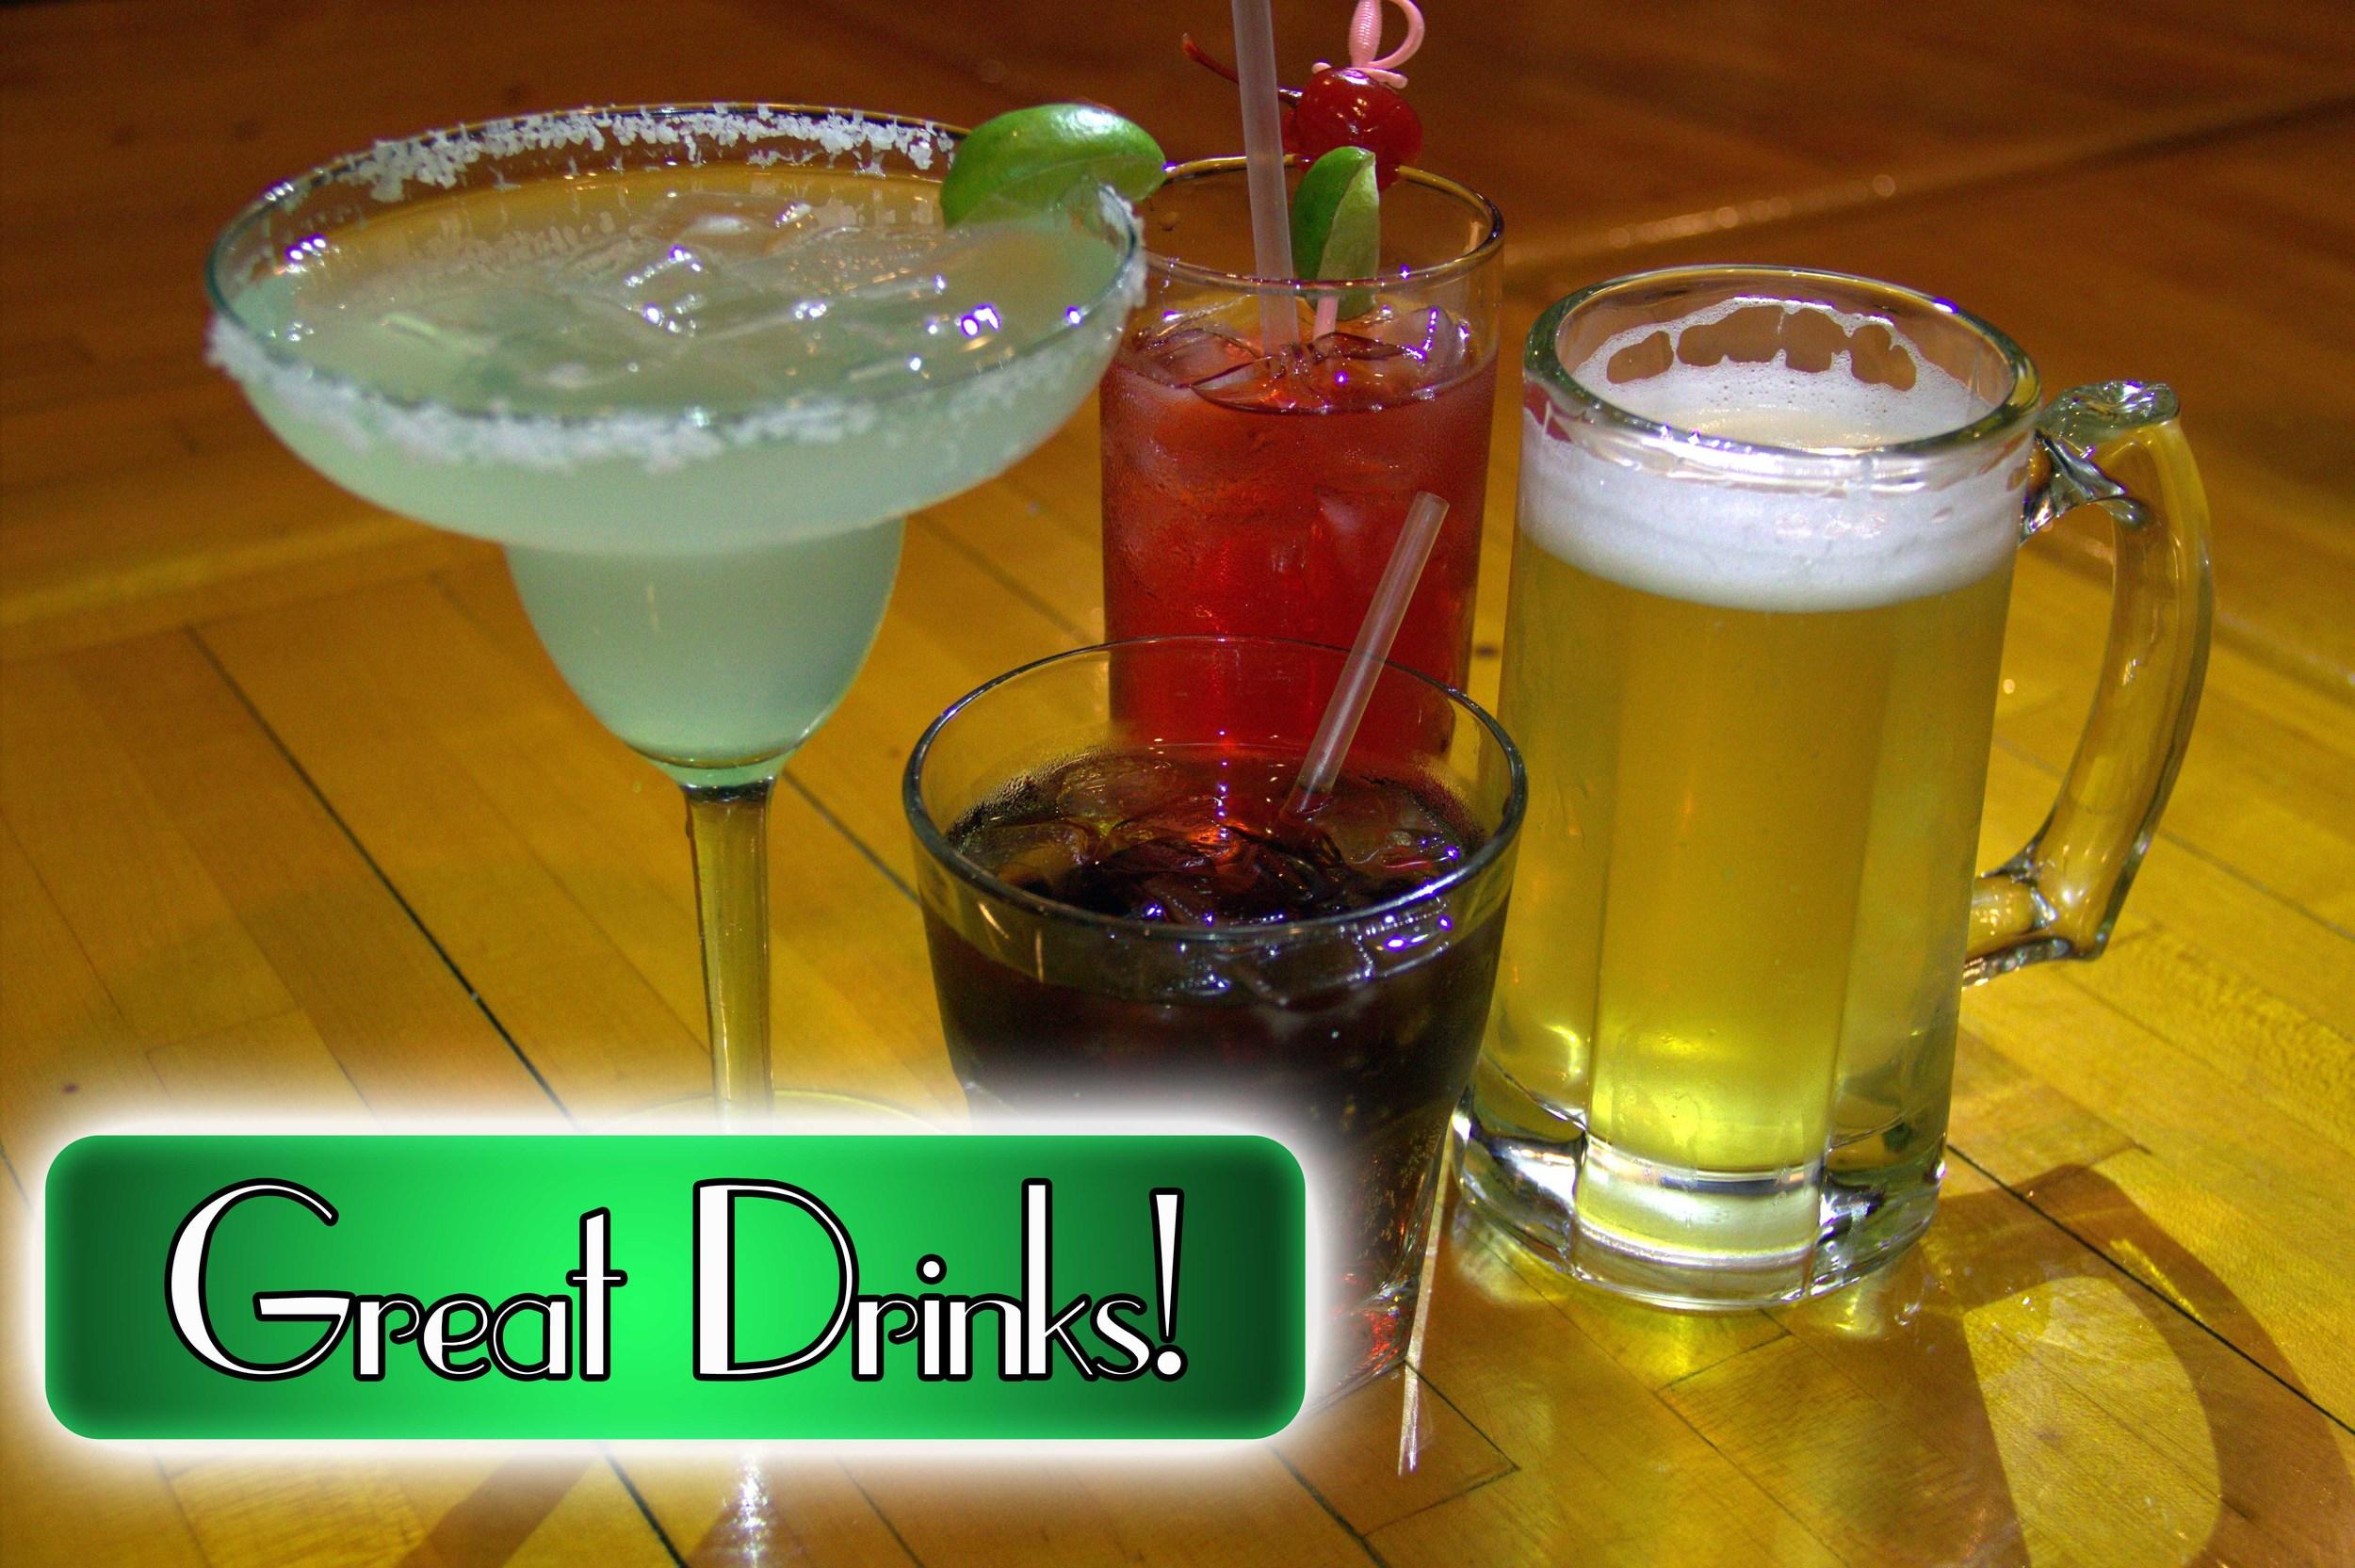 great drinks.jpg